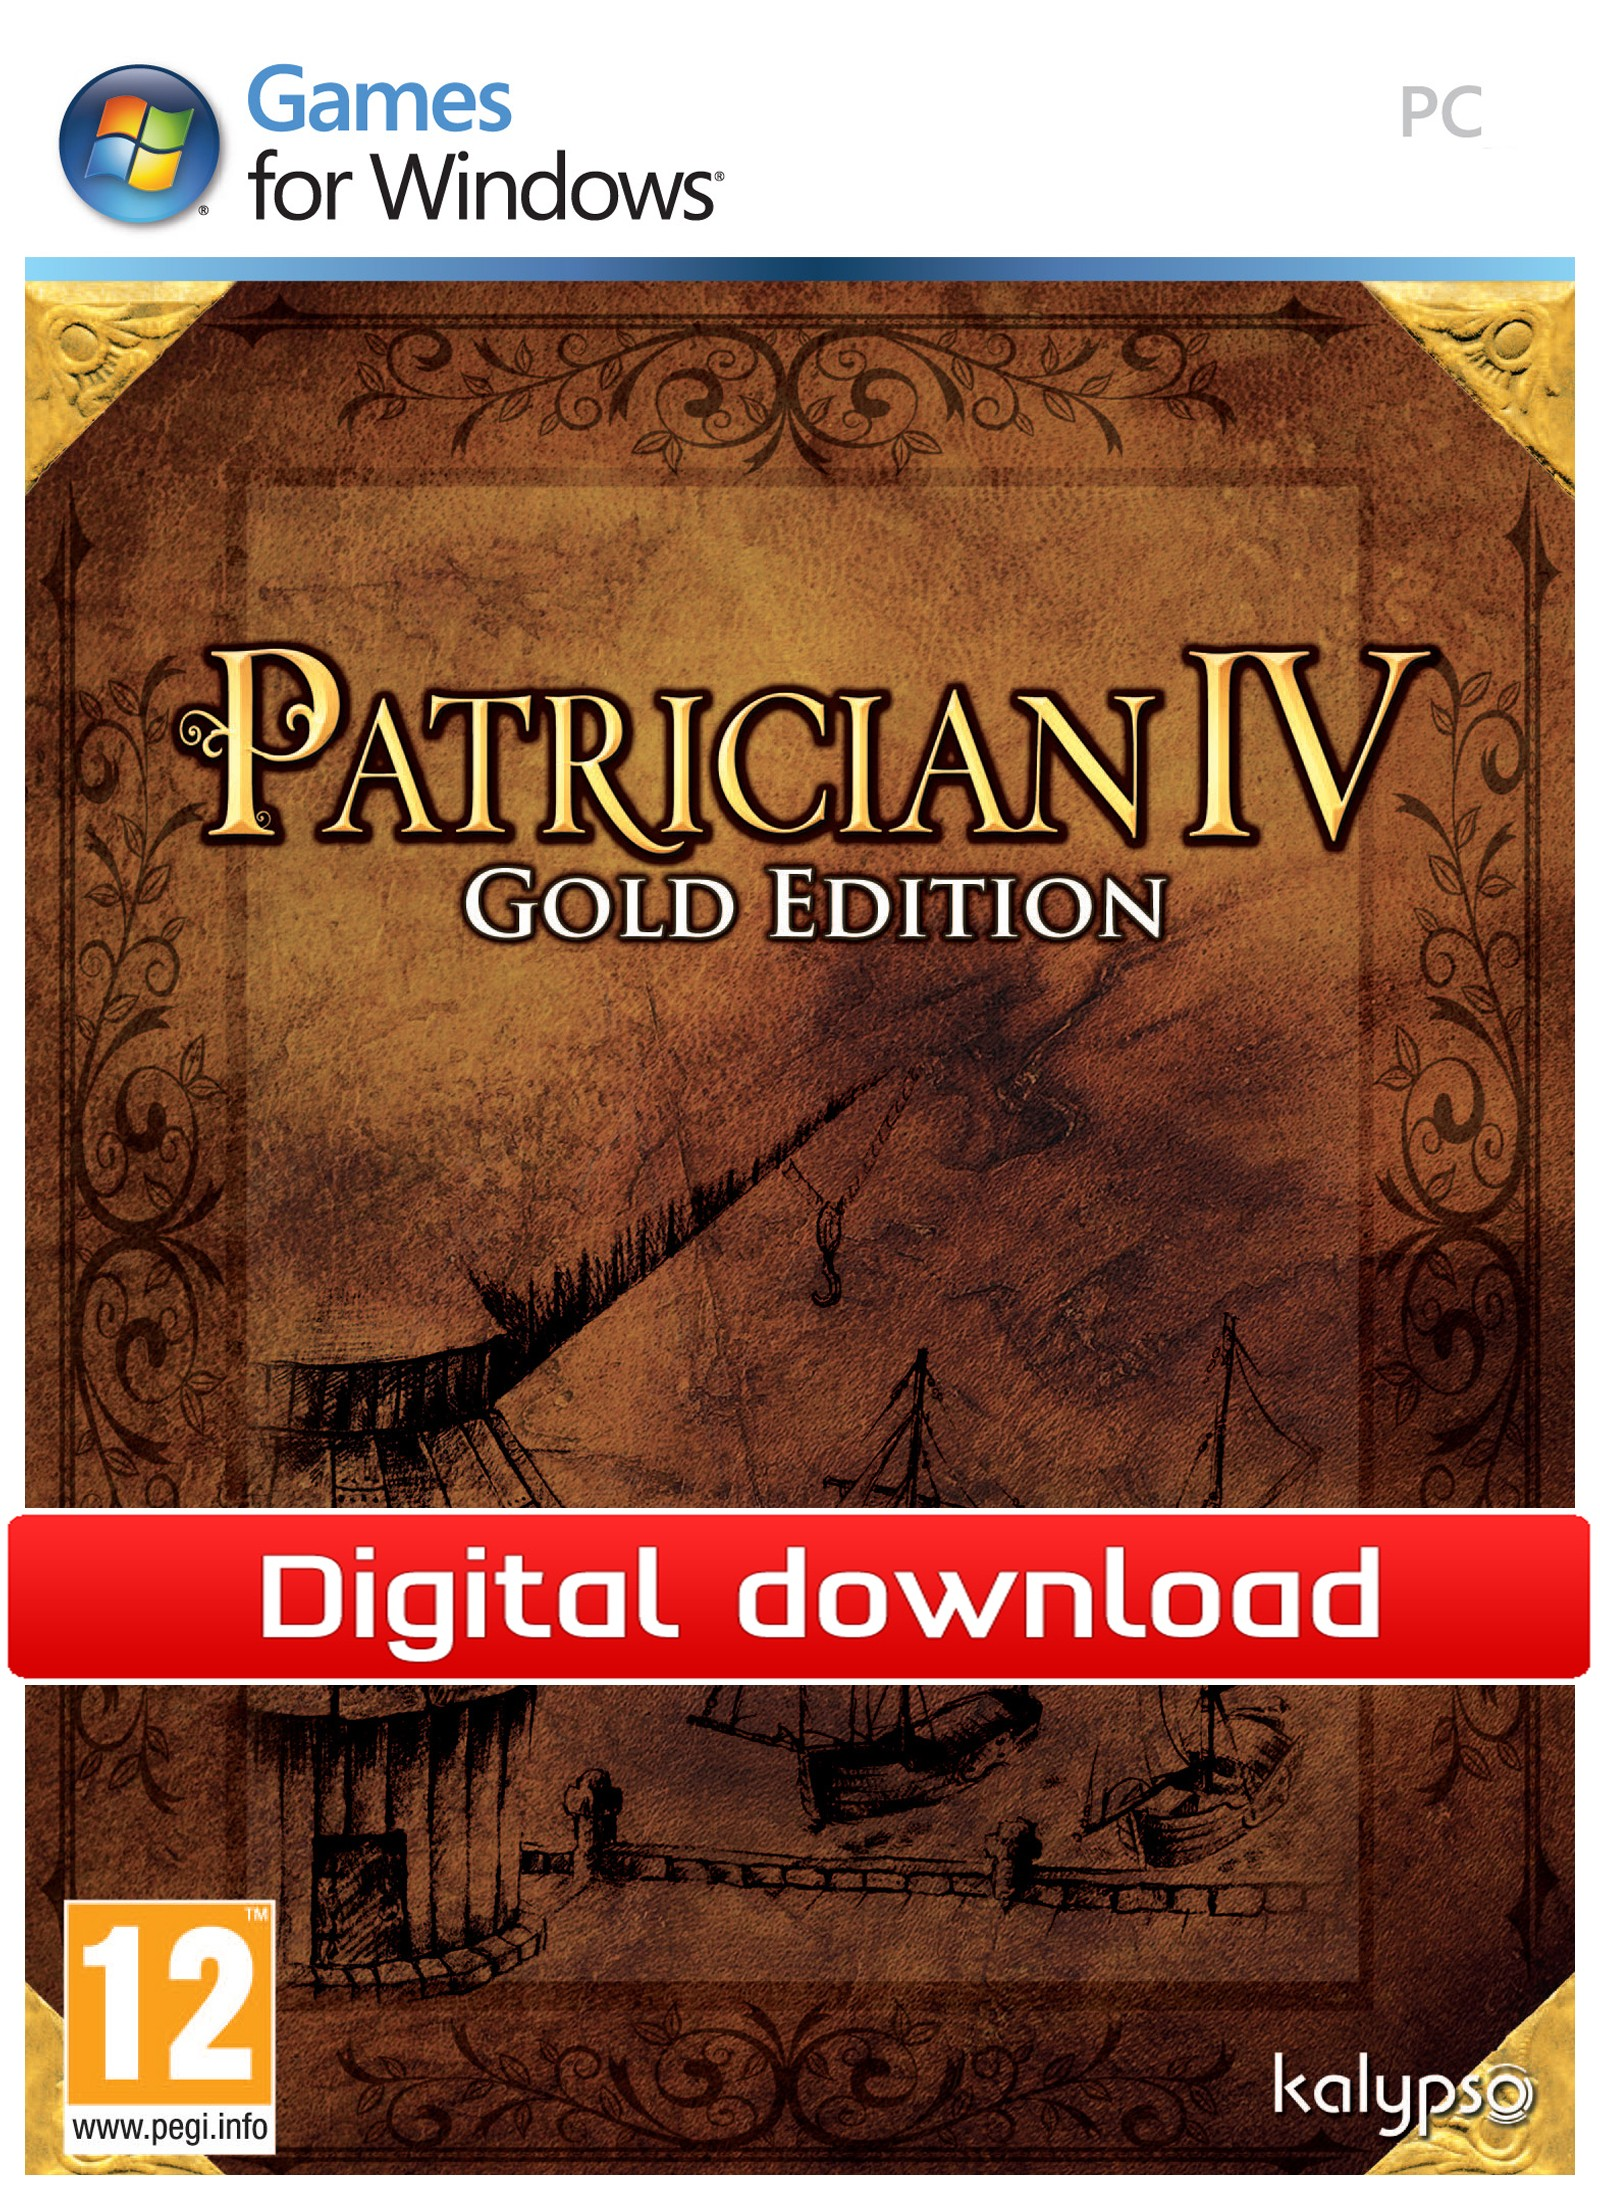 27074 : Patrician IV Gold Edition (PC nedlastning)